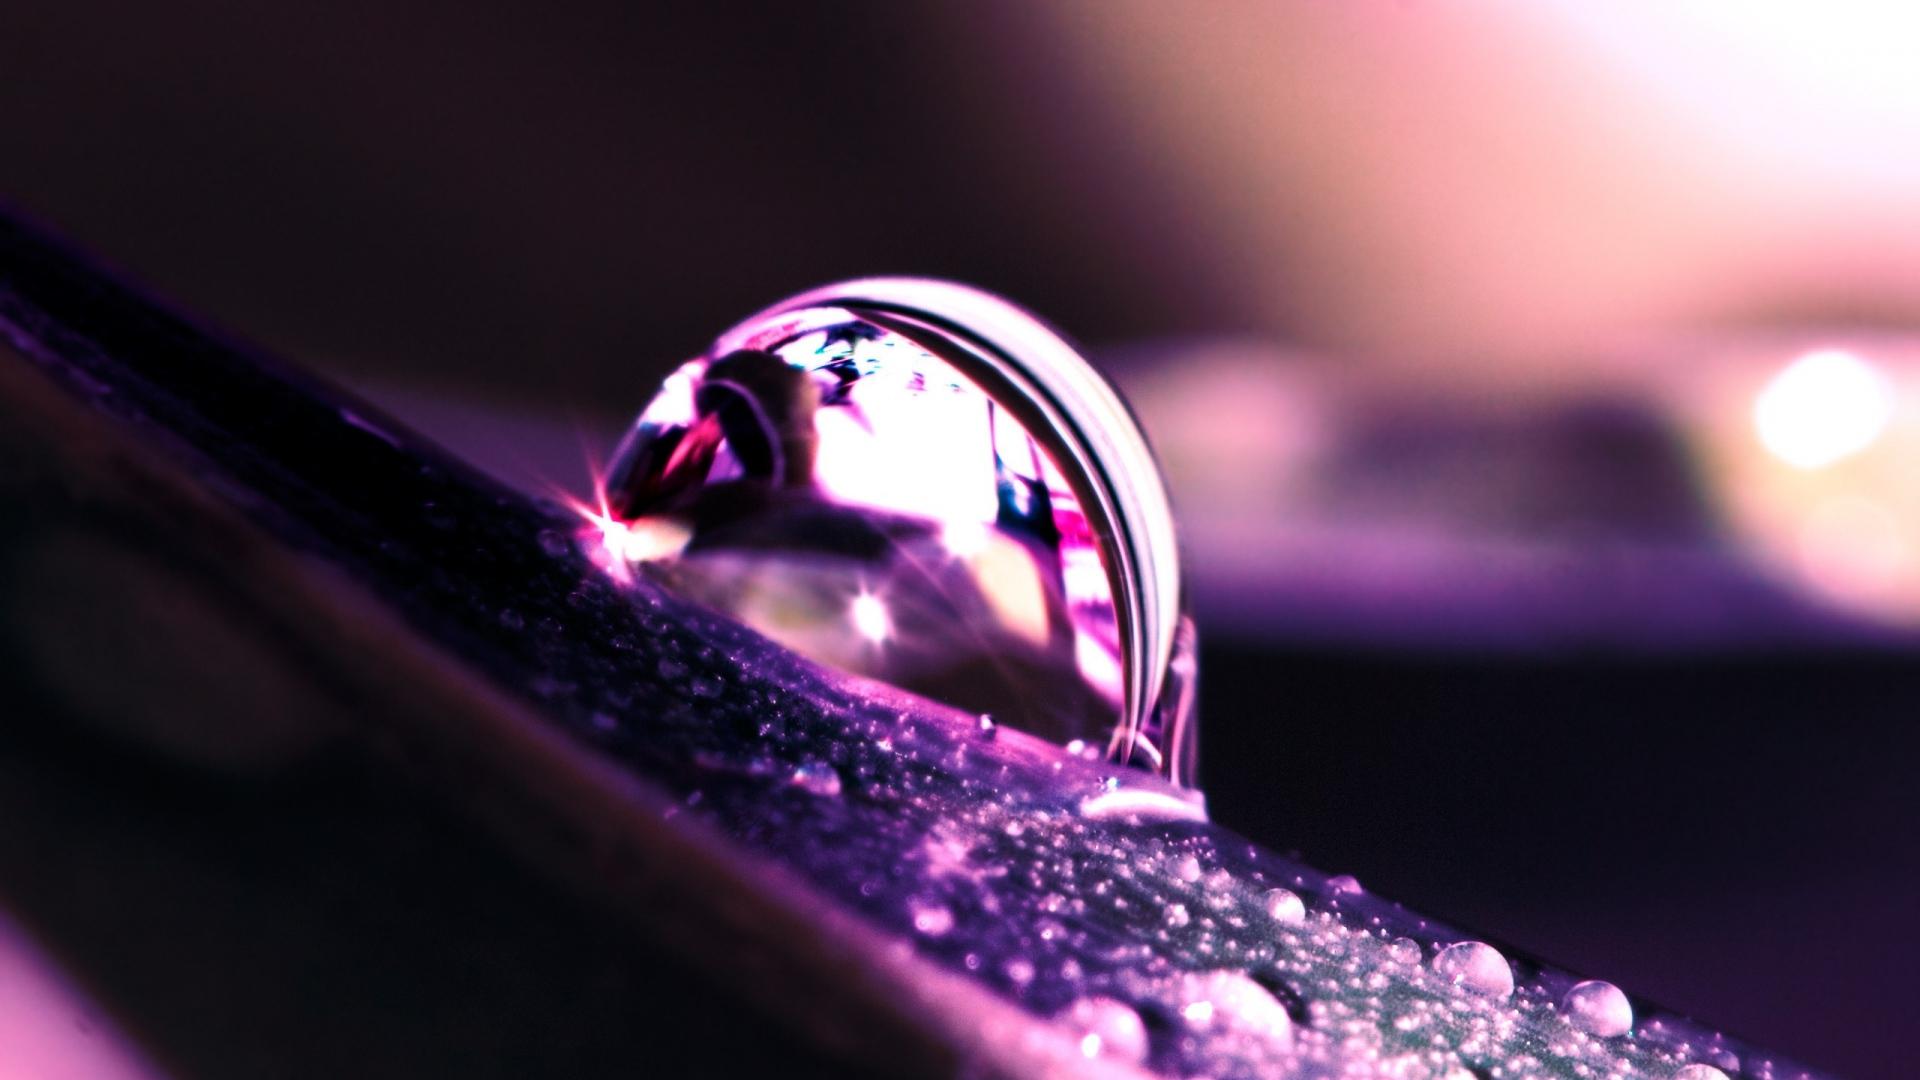 water dew computer background